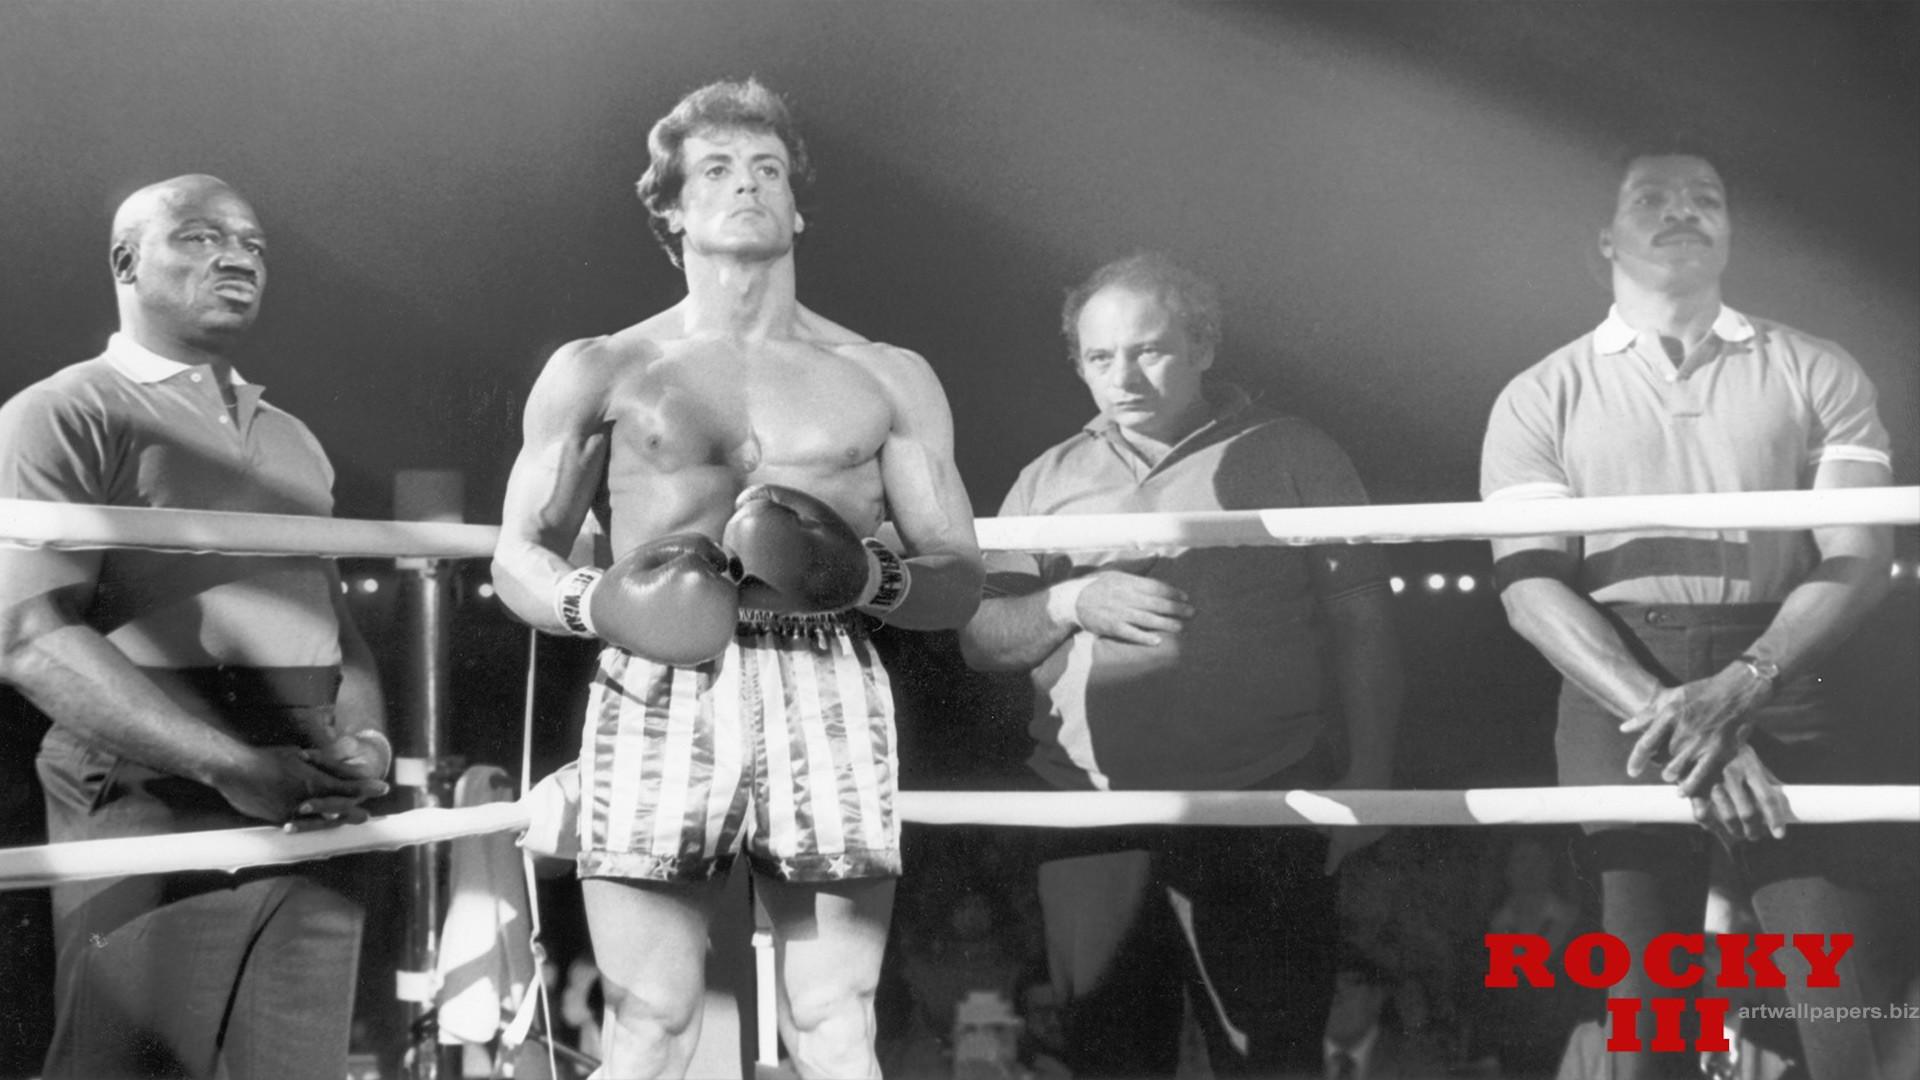 Rocky Wallpapers – Rocky Wallpaper Movie